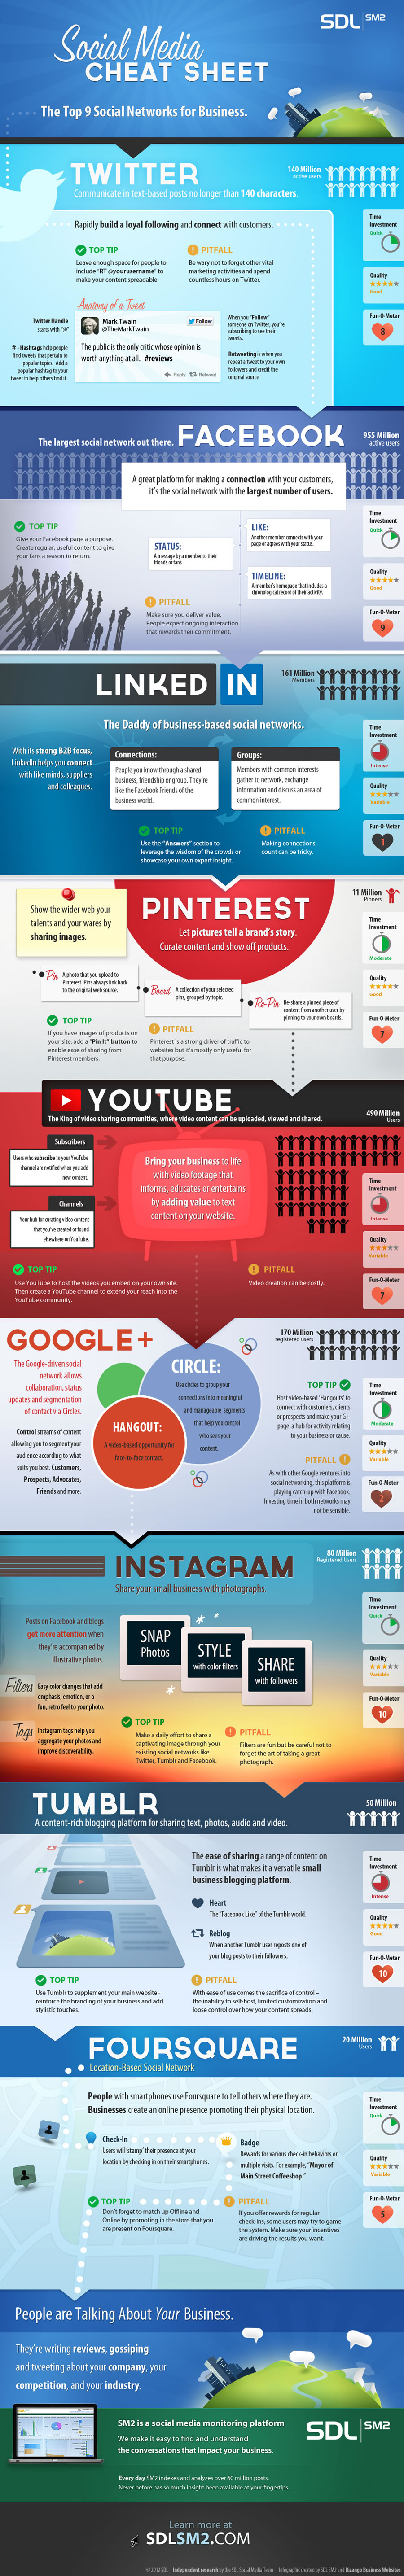 Social-Media-Cheat-Sheet-Infographic